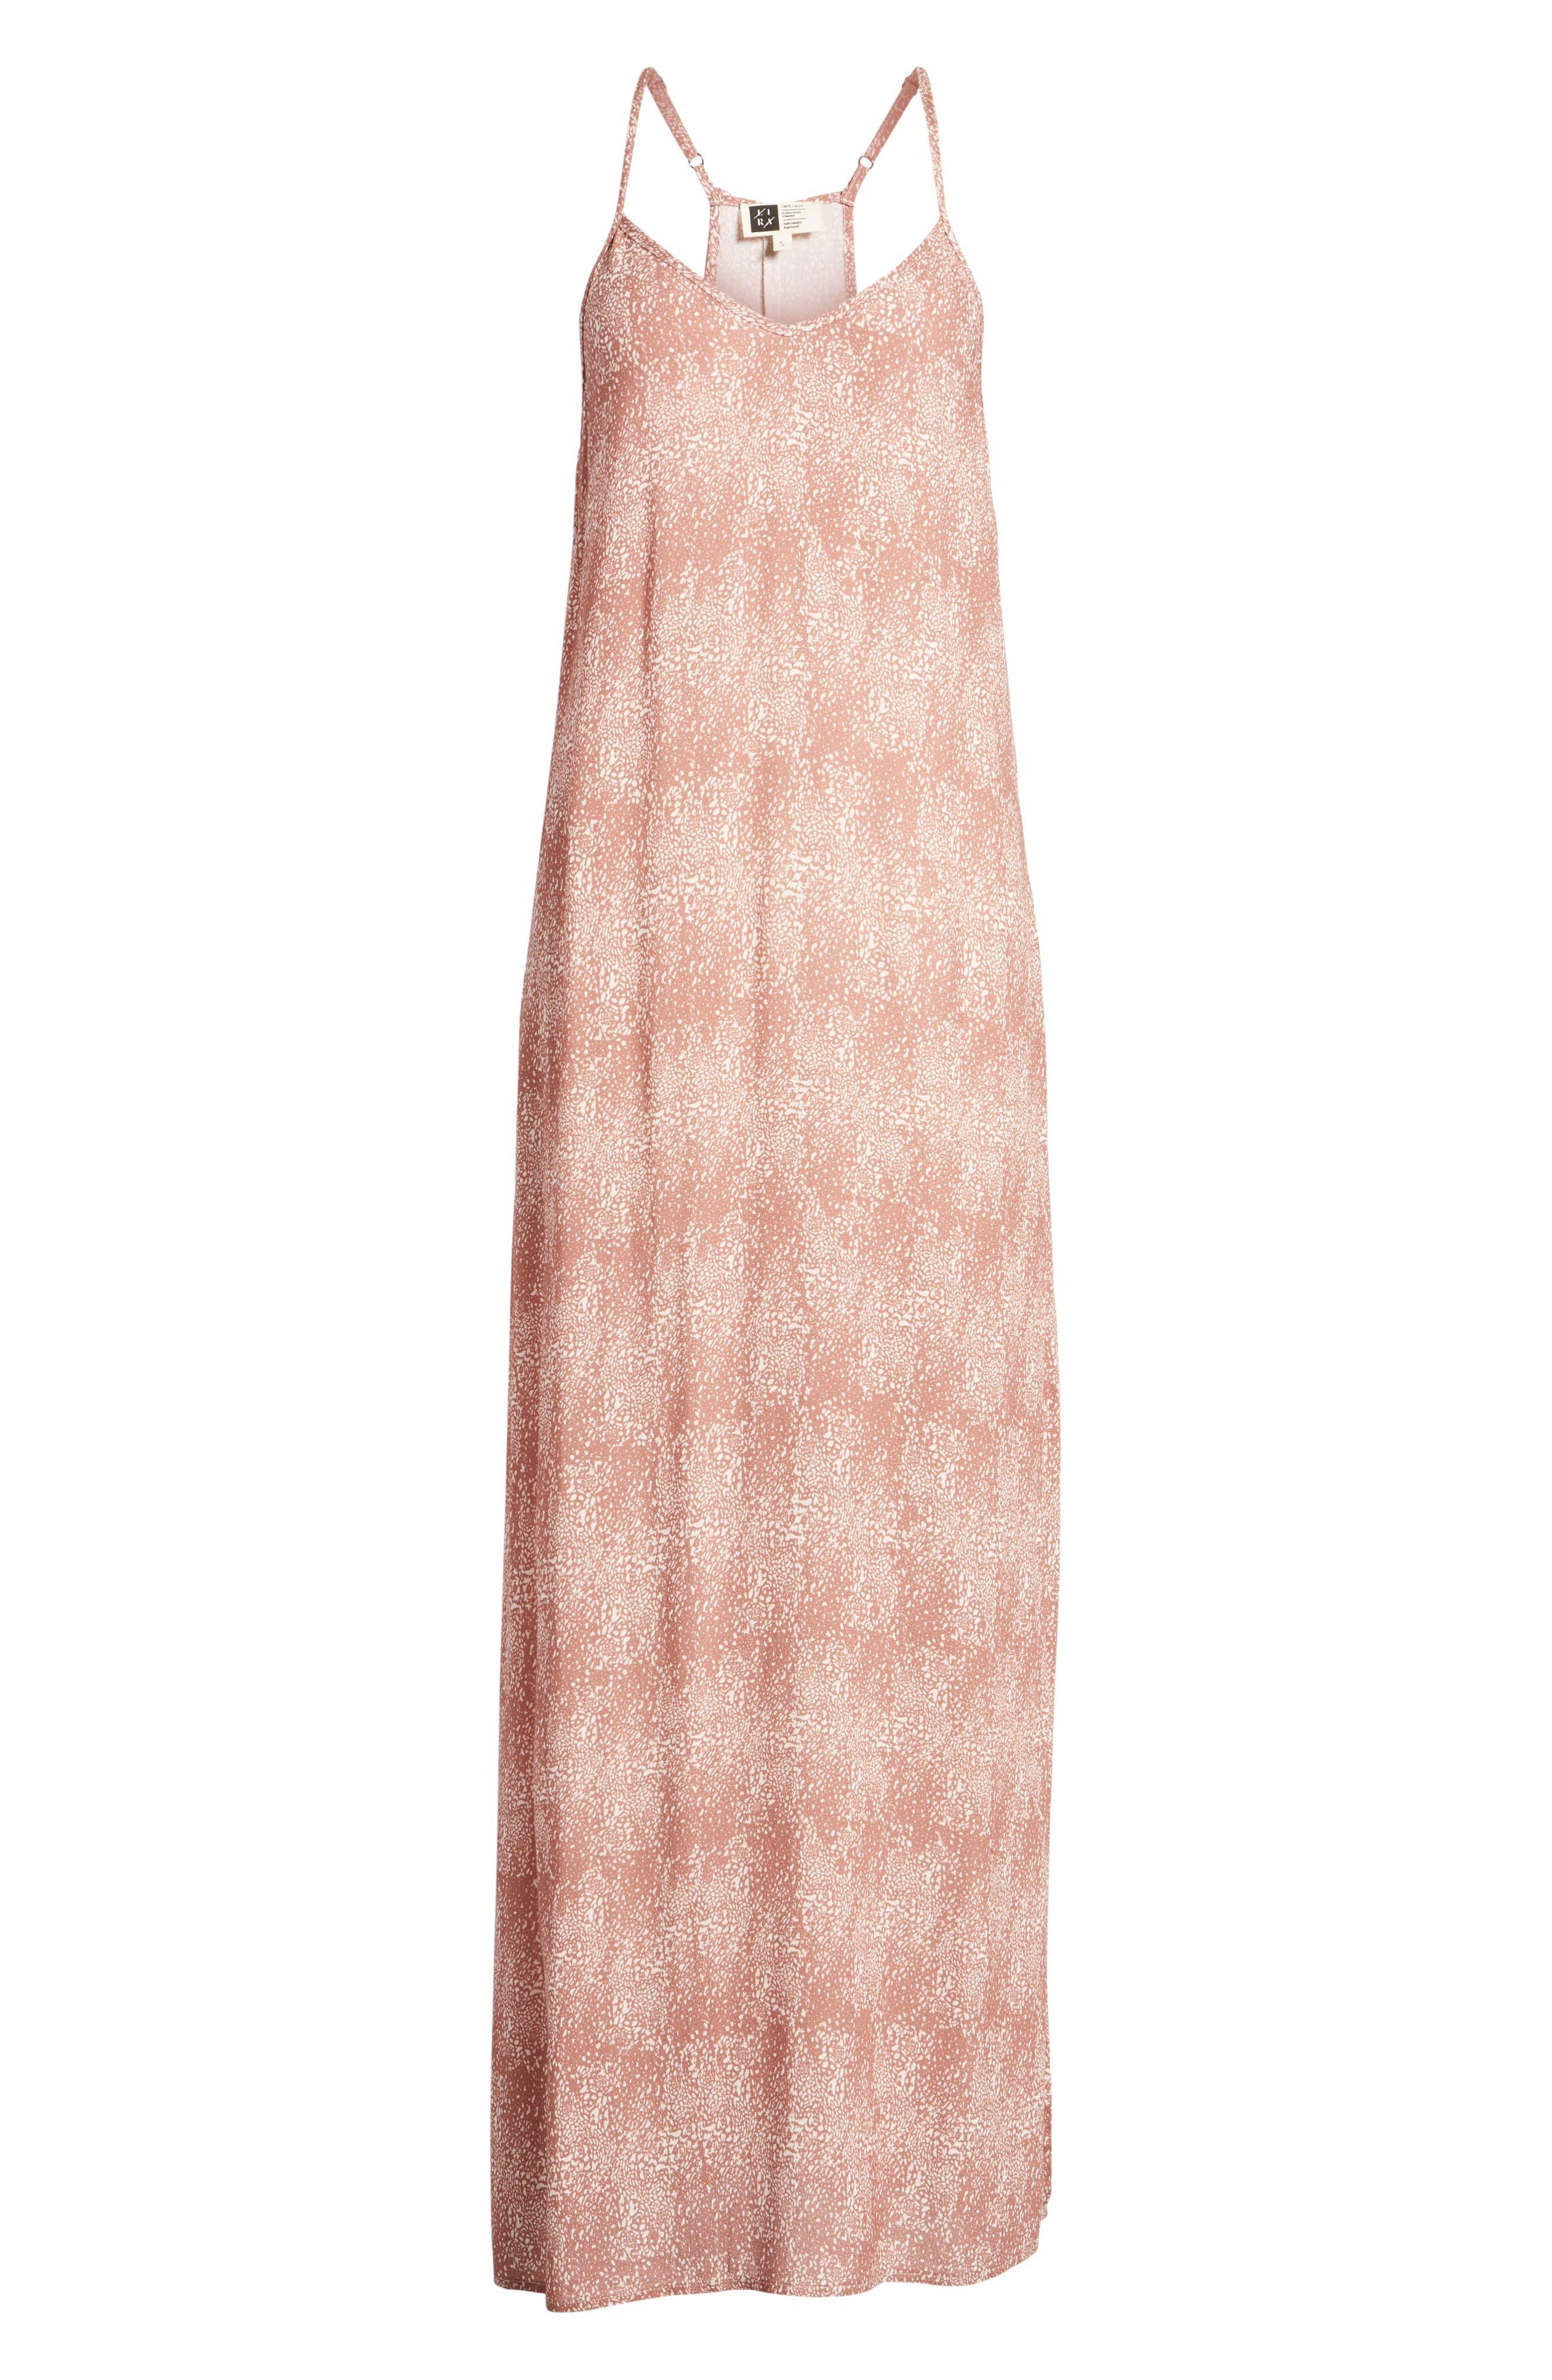 Misty Morning Maxi Dress,                             Alternate thumbnail 7, color,                             Nutmeg